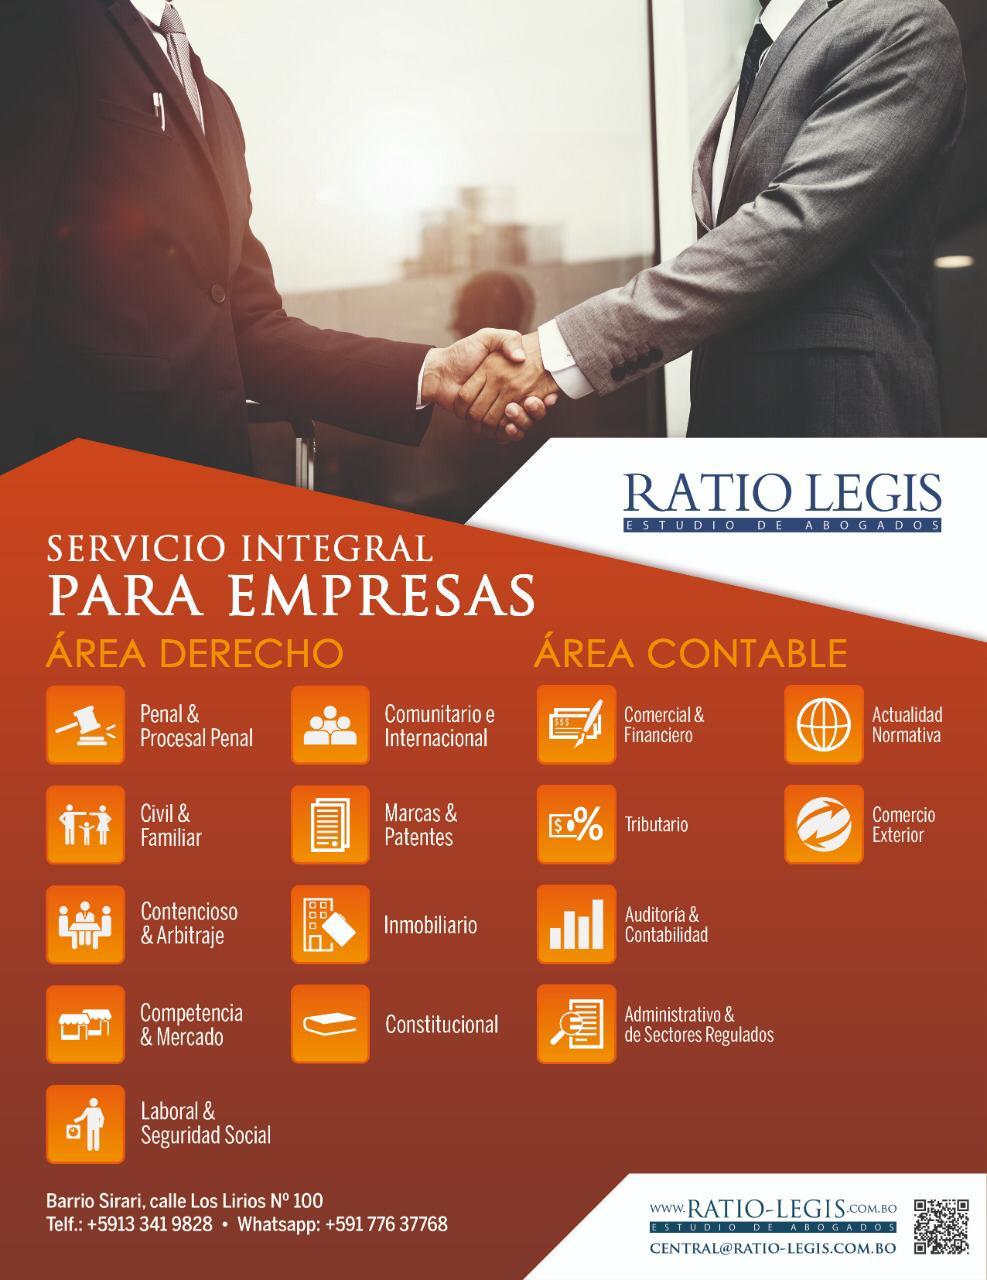 Servicio Integral para Empresas